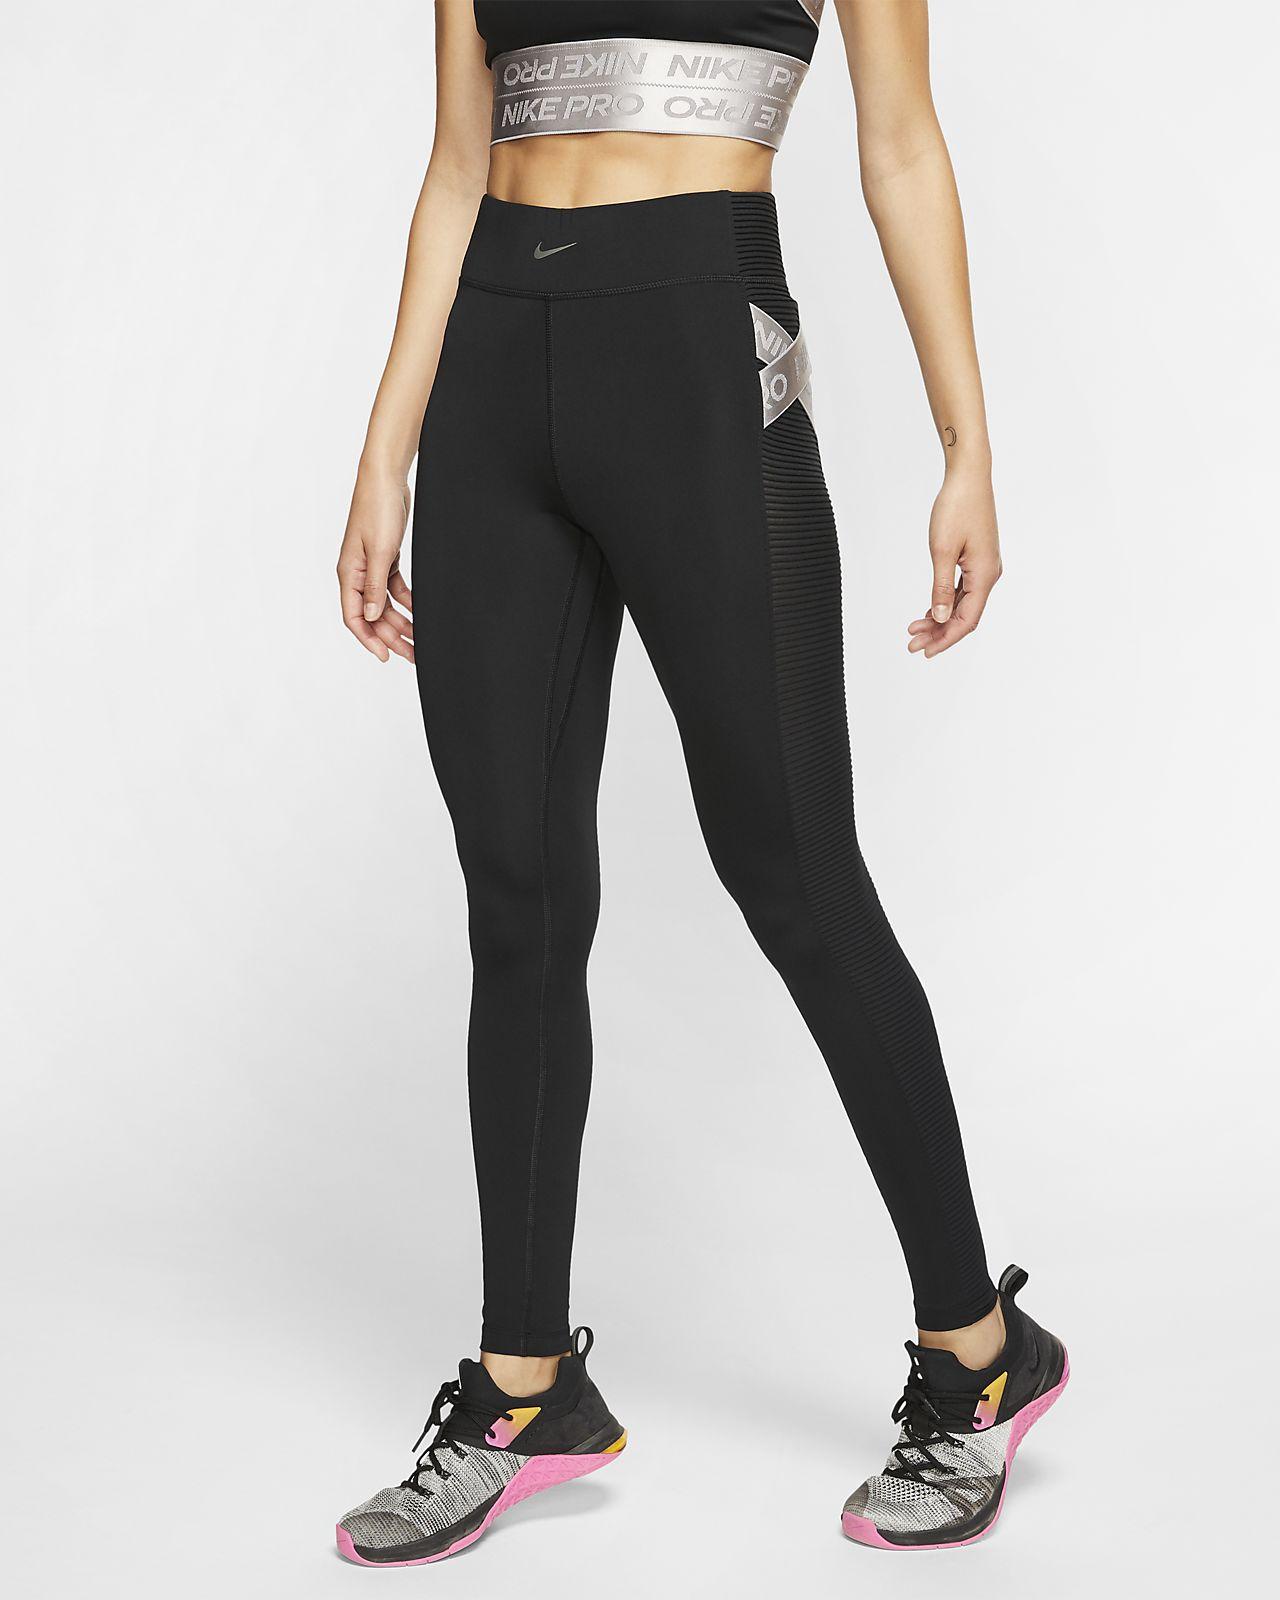 Nike Pro AeroAdapt Women's Leggings